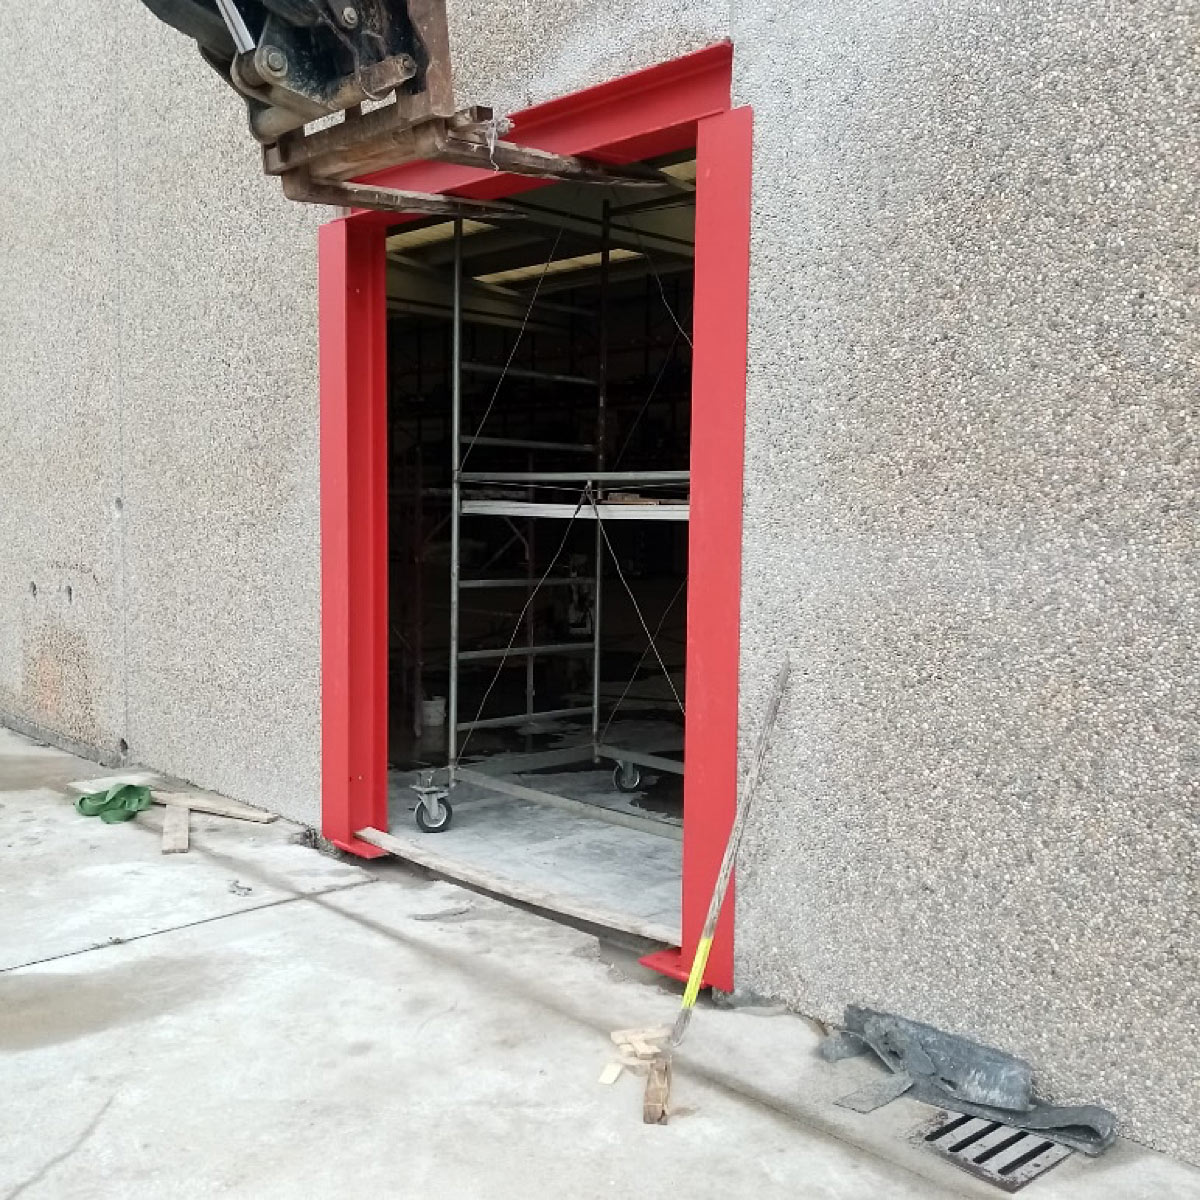 Creazione aperture: aprire una porta in un muro